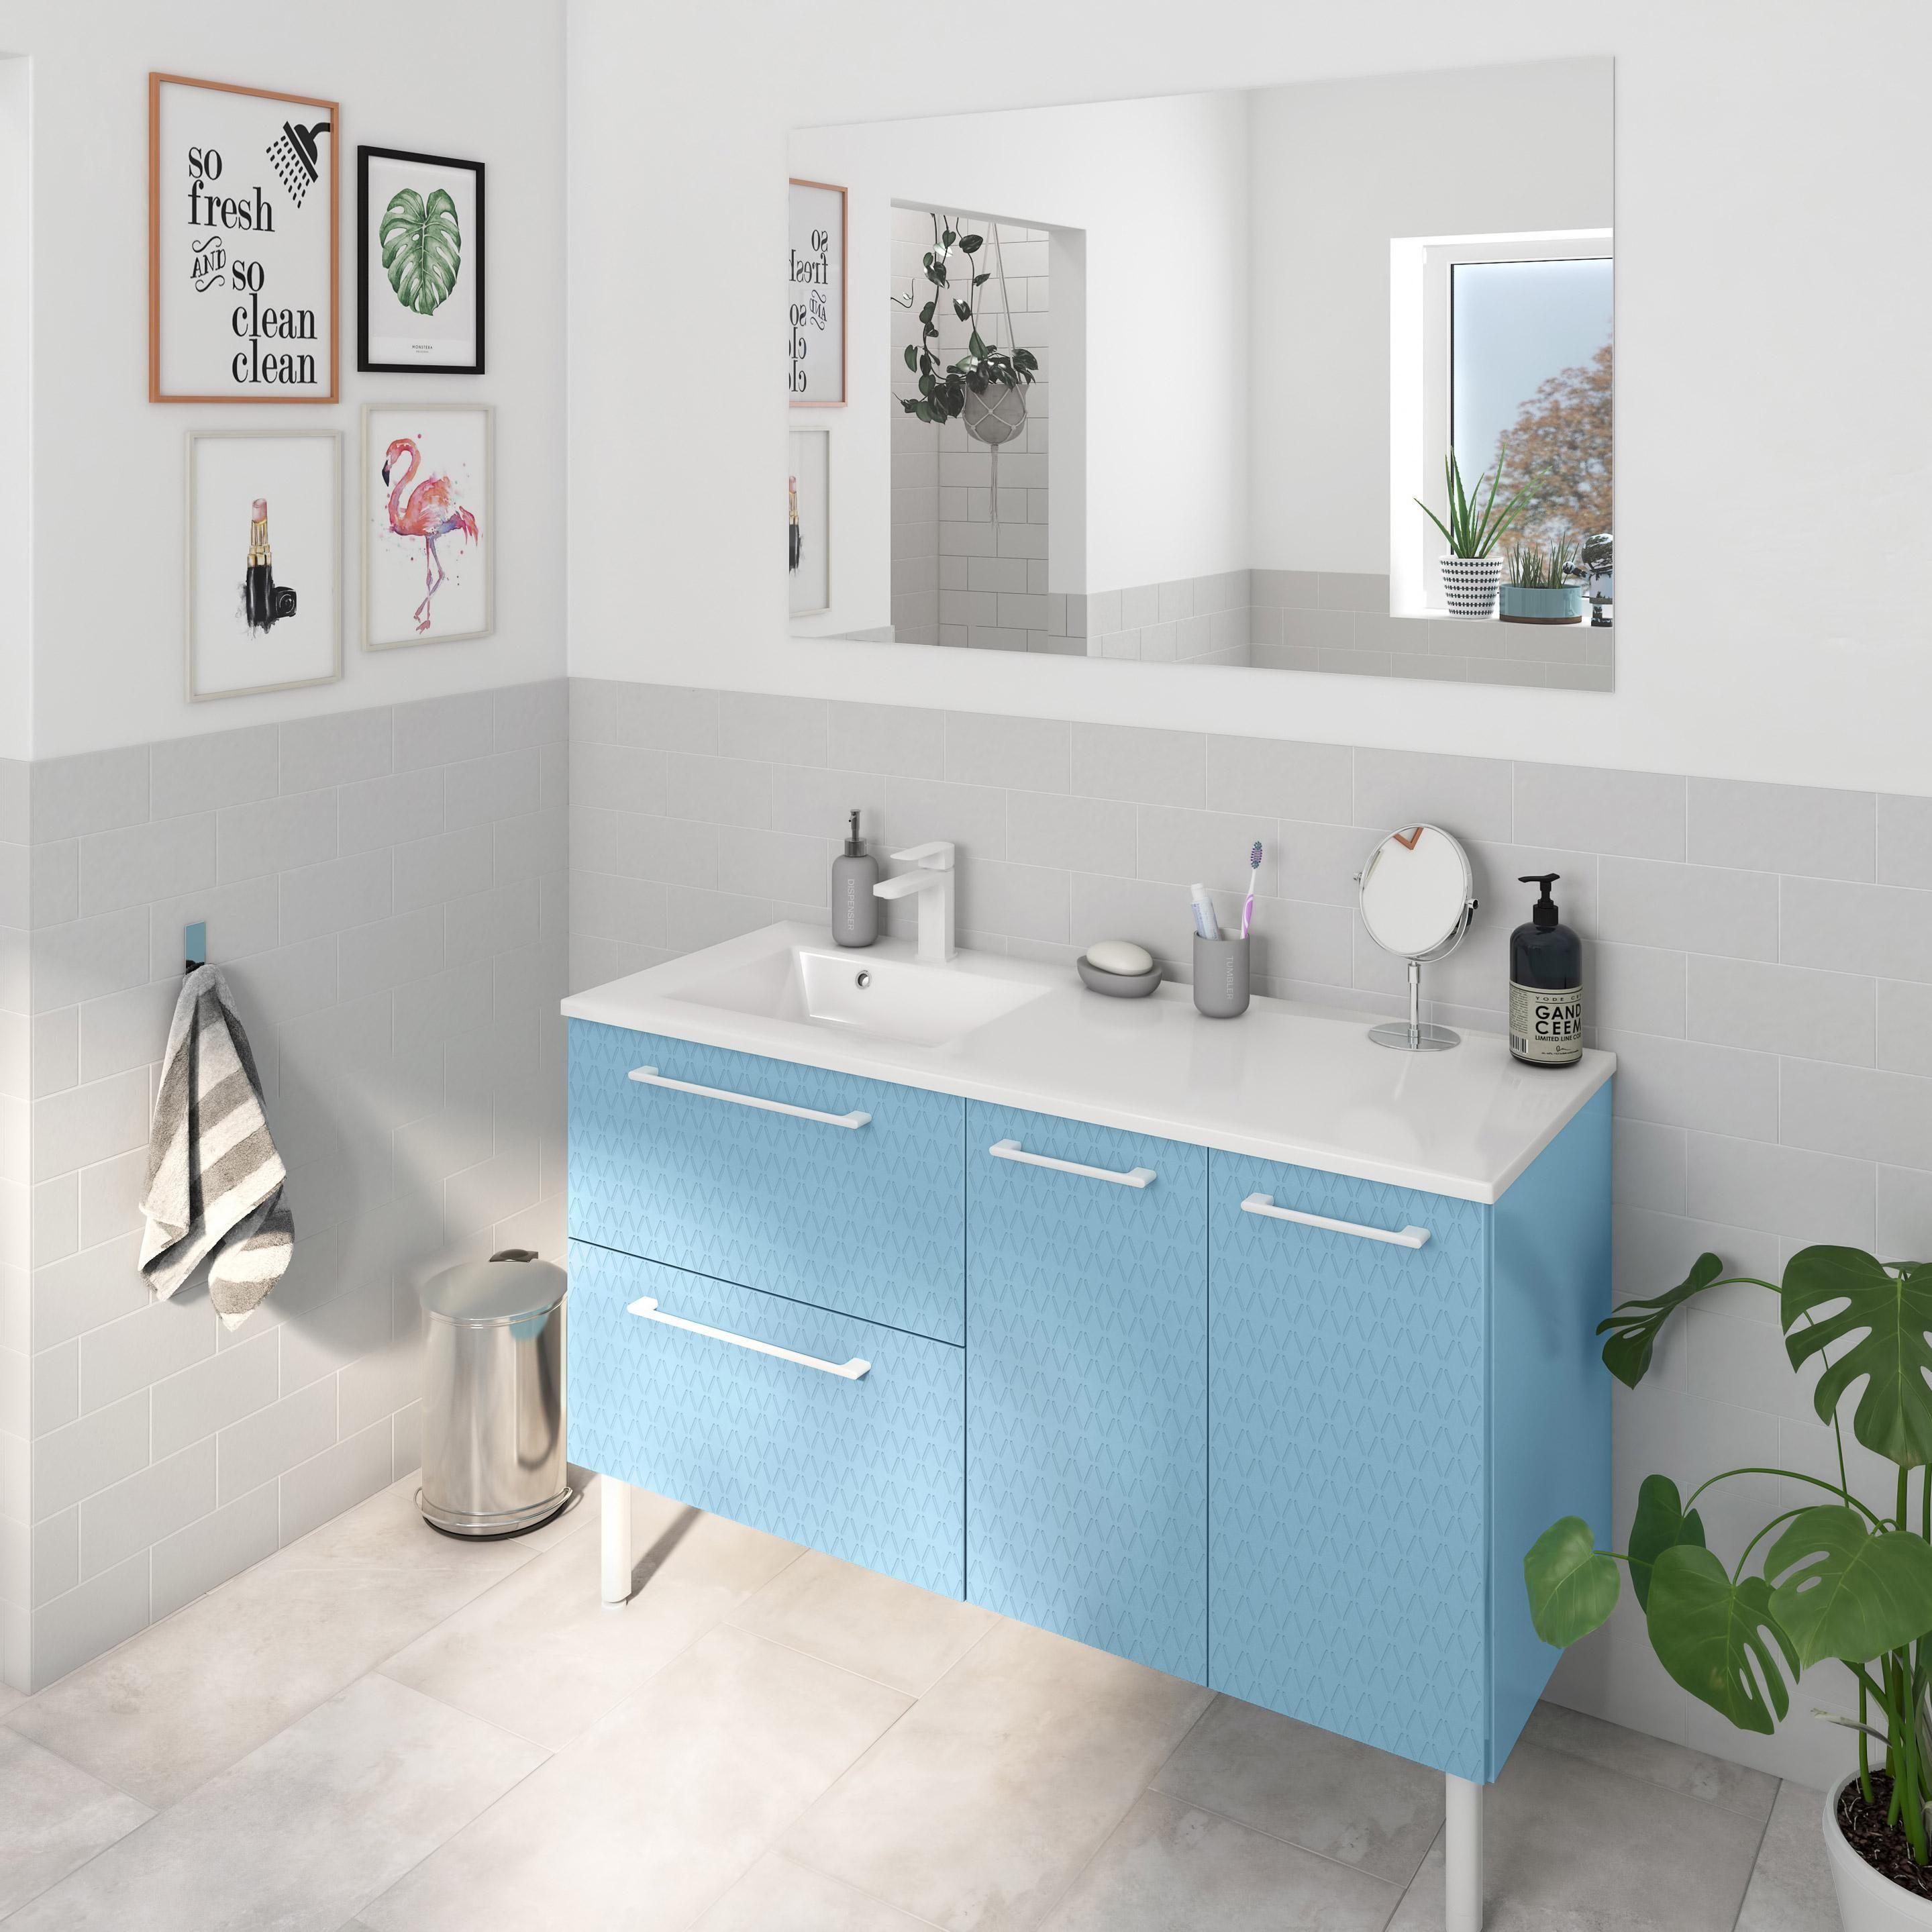 Meuble De Salle De Bains Remix En 2020 Meuble Simple Meuble Sous Vasque Et Salle De Bain